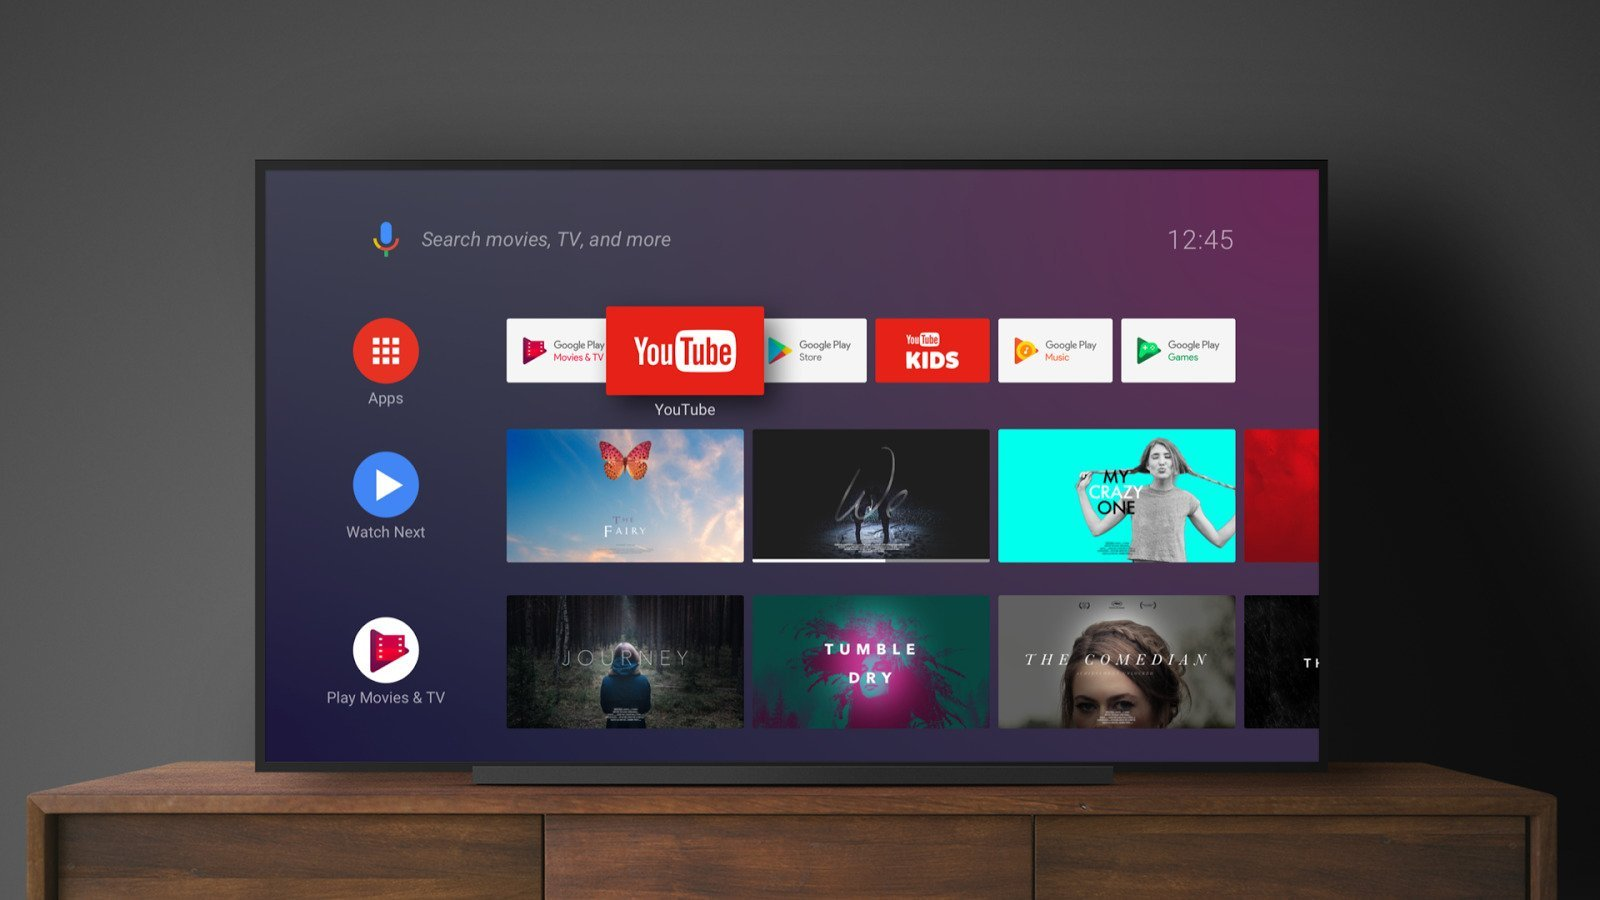 Android TV : Google dévoile ses plans pour Android 11 et Android 12